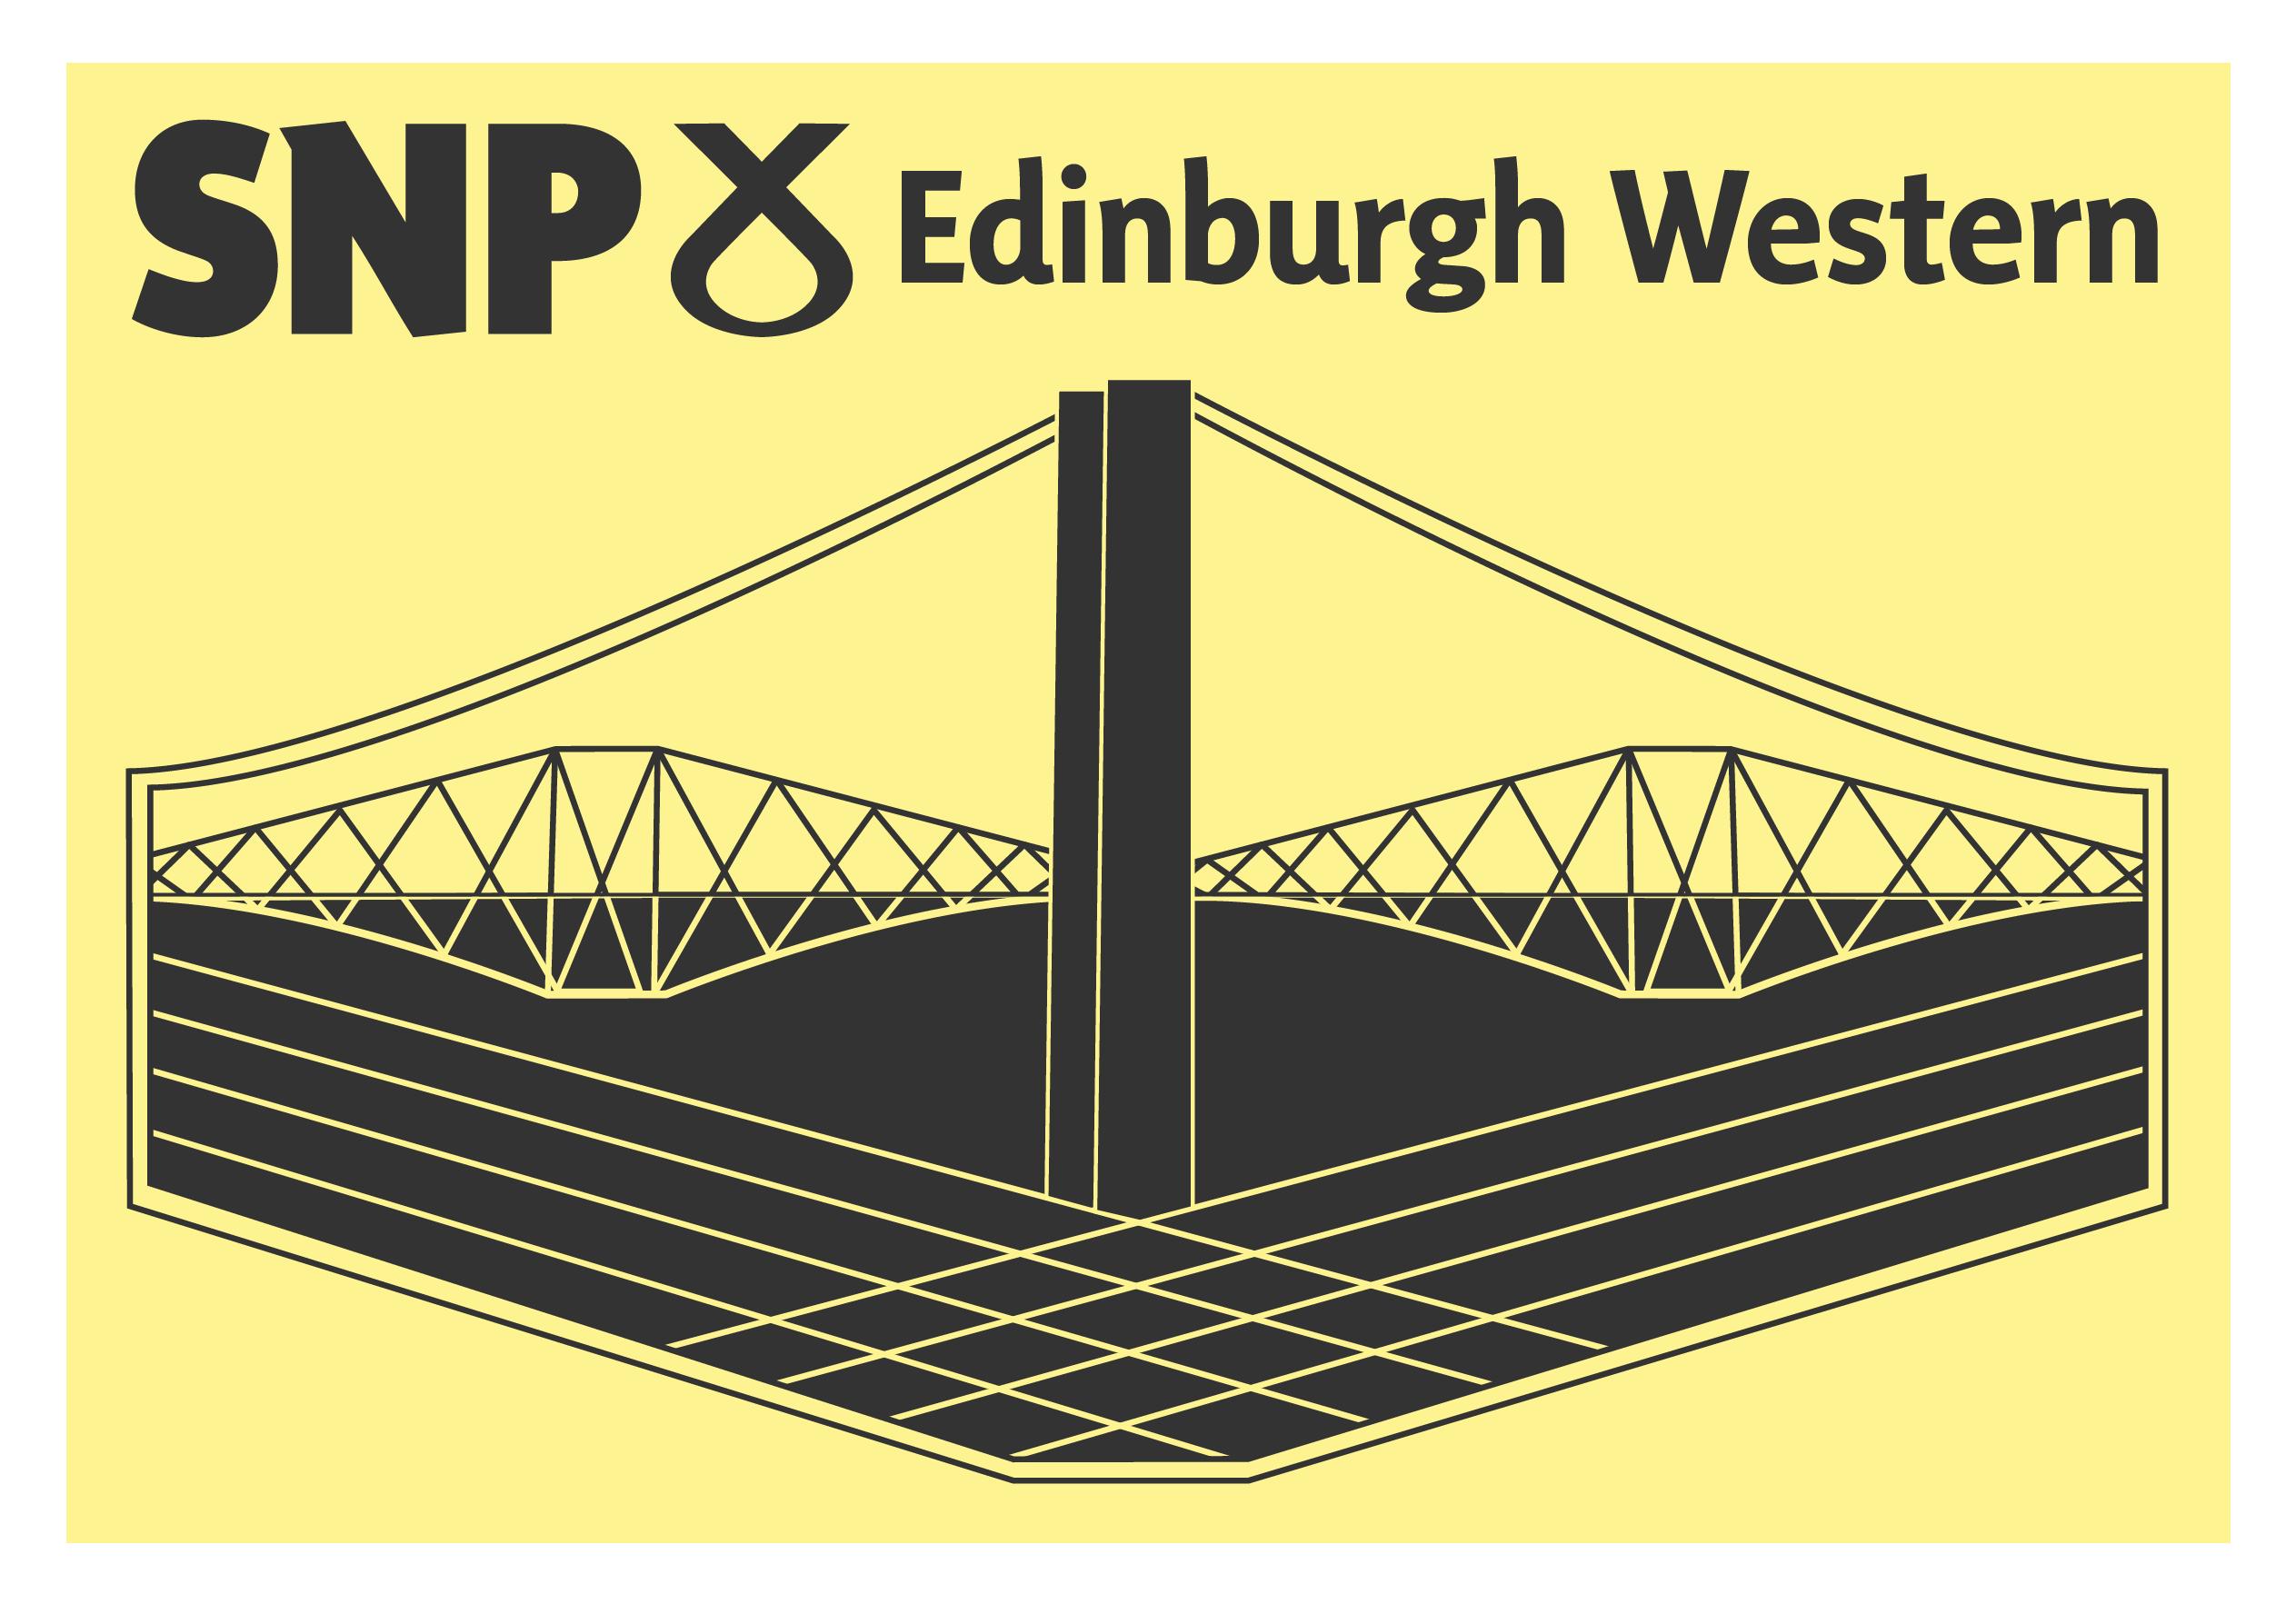 Edinburgh Western Logo featuring the SNP clootie and three bridges of Queensferry